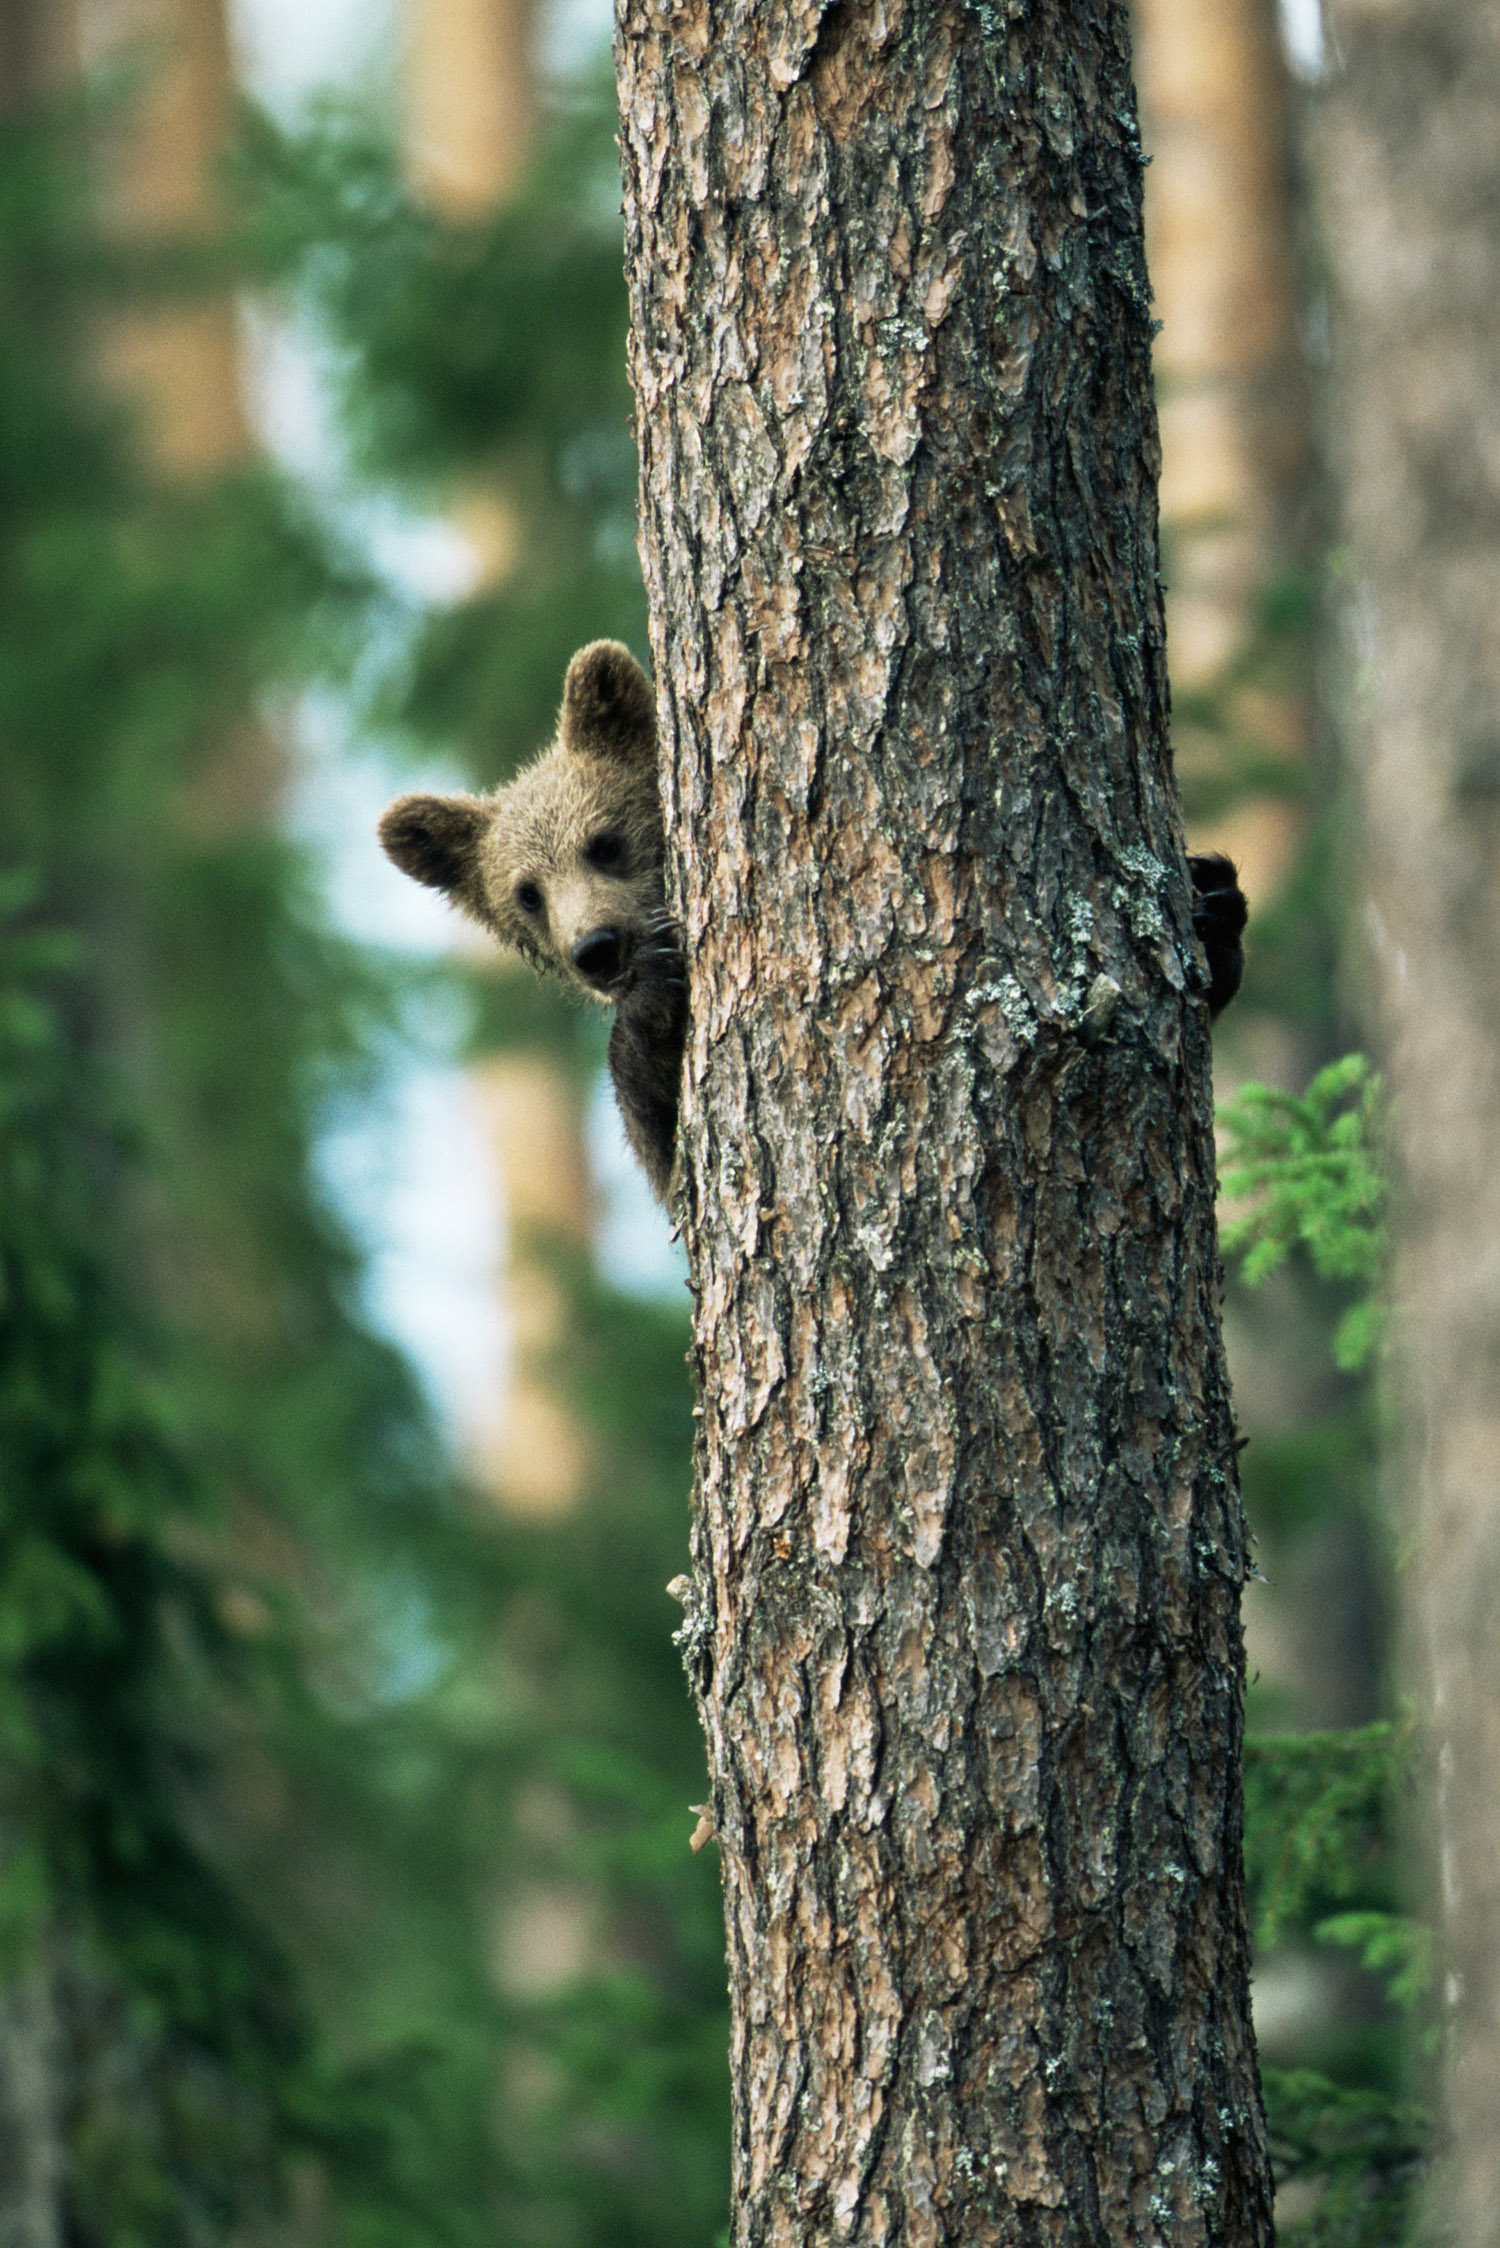 Brown bear cub in tree, Suomussalmi, Finland